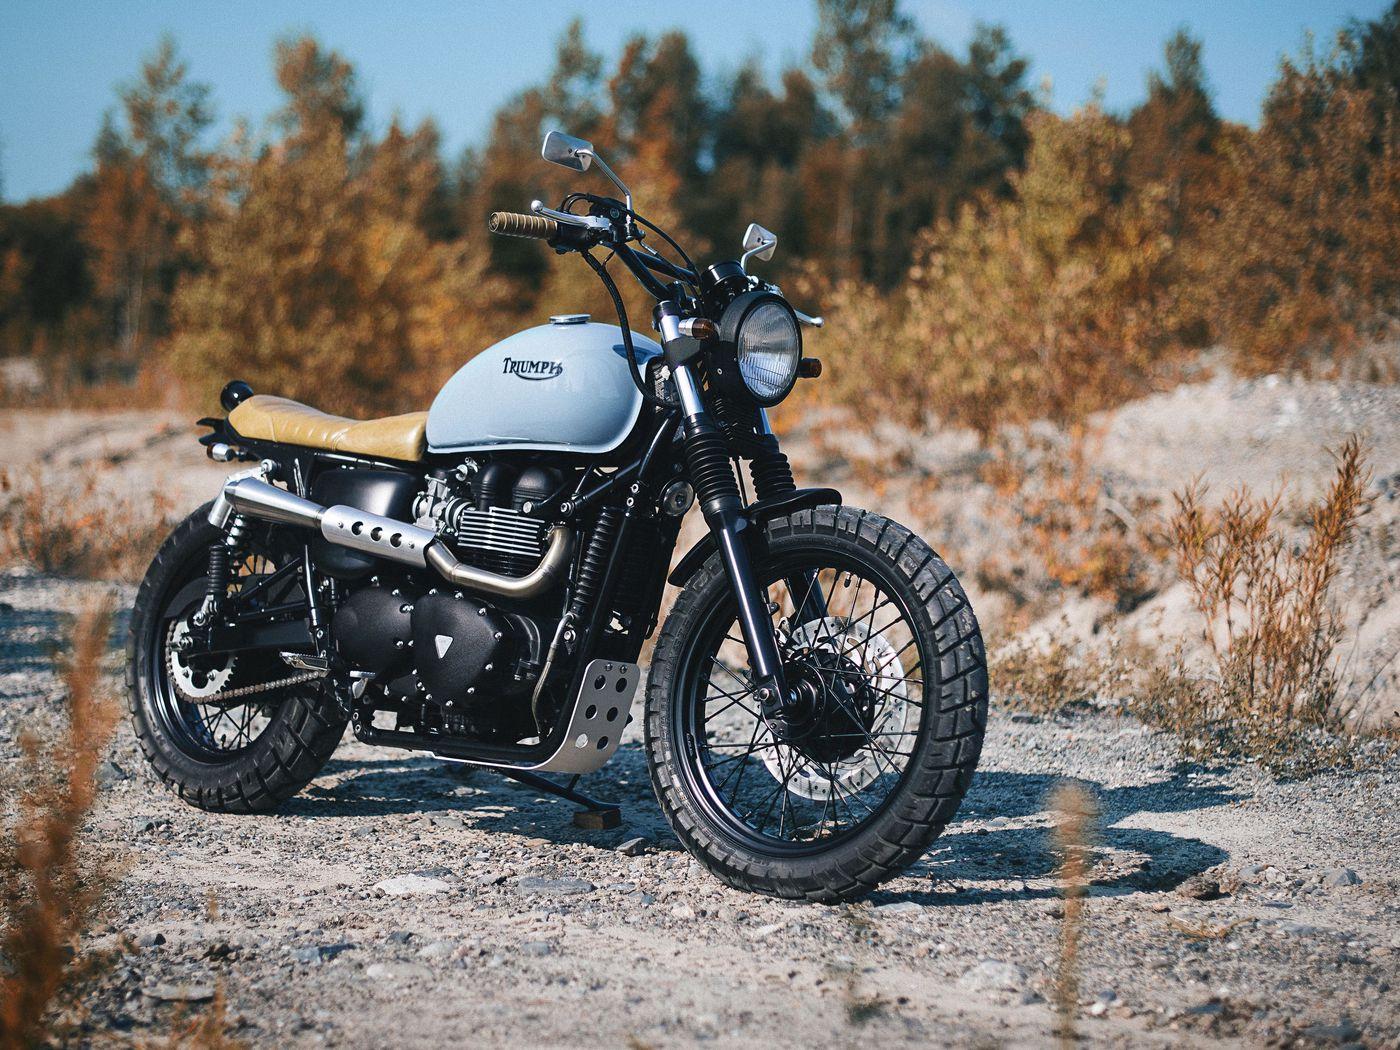 1400x1050 Обои triumph, bonneville, мотоцикл, вид сбоку